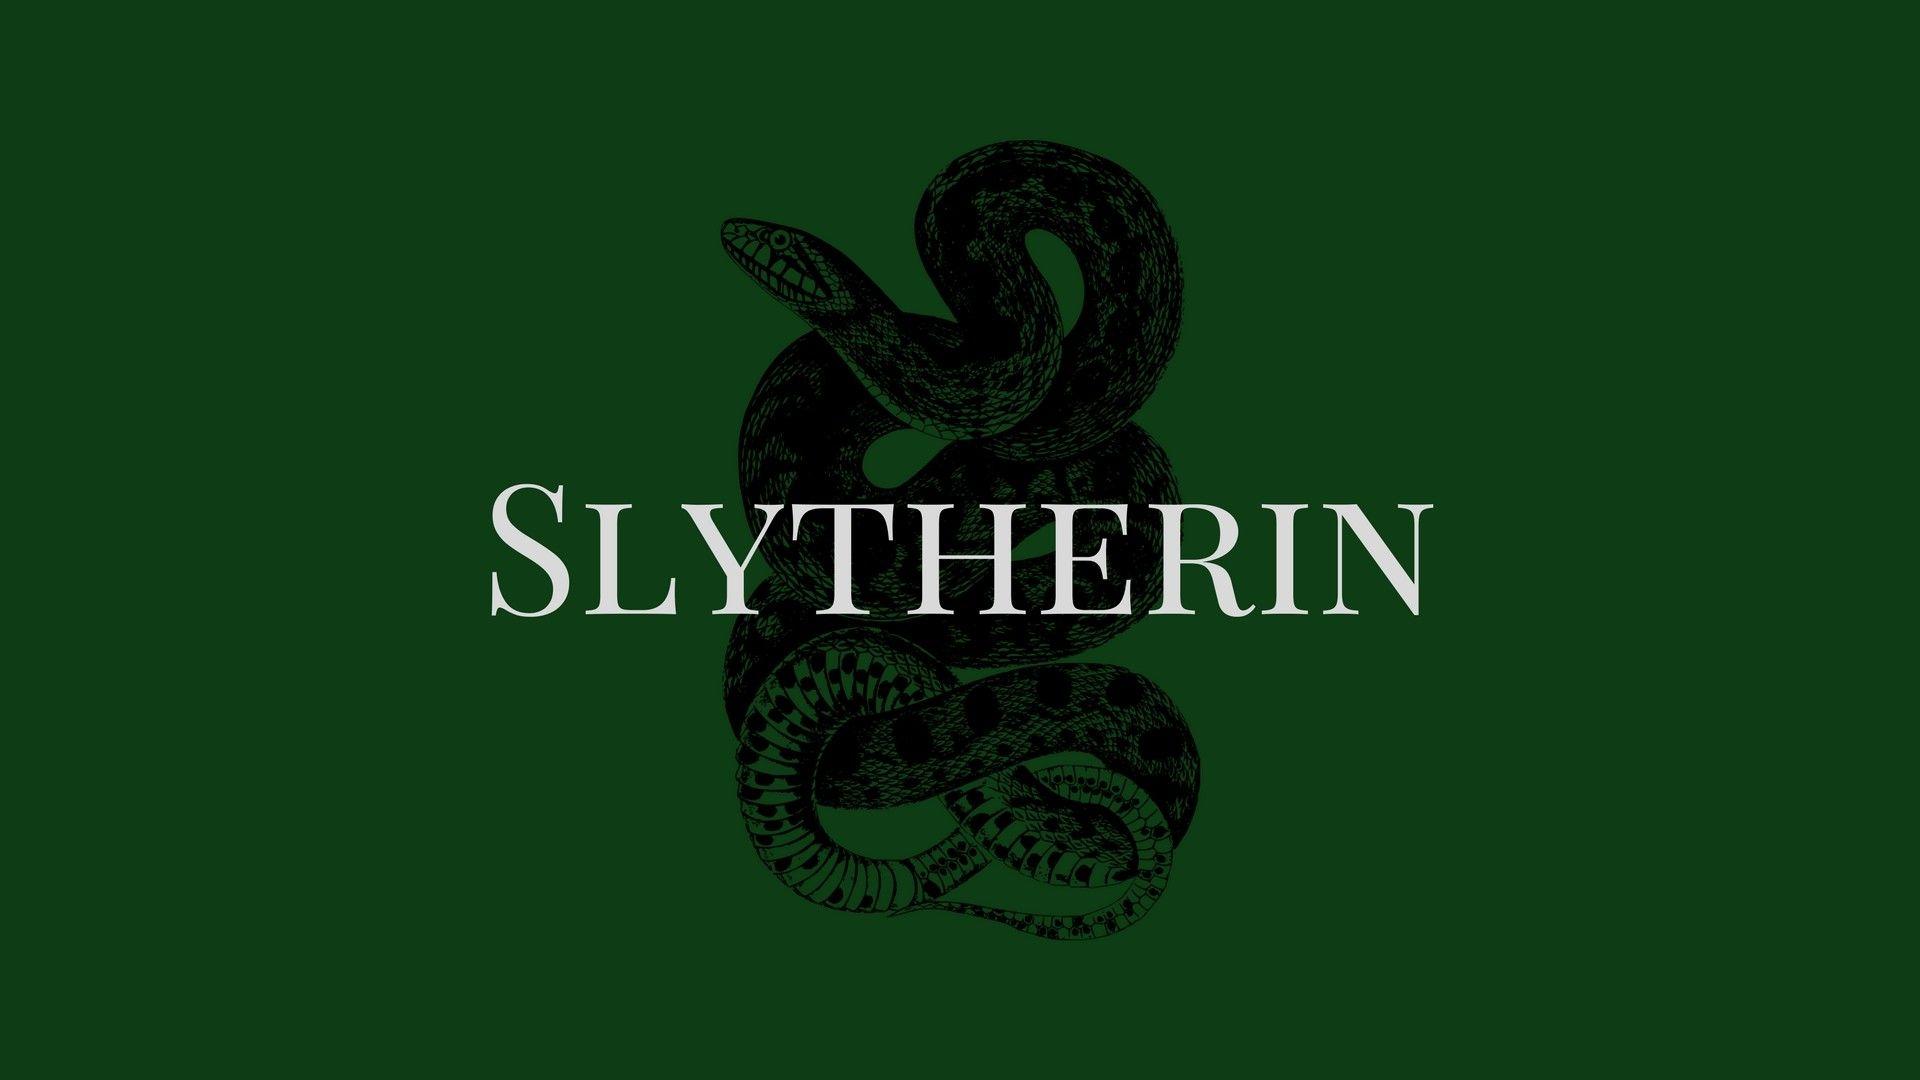 Slytherin Aesthetic Desktop Wallpapers On Wallpaperdog